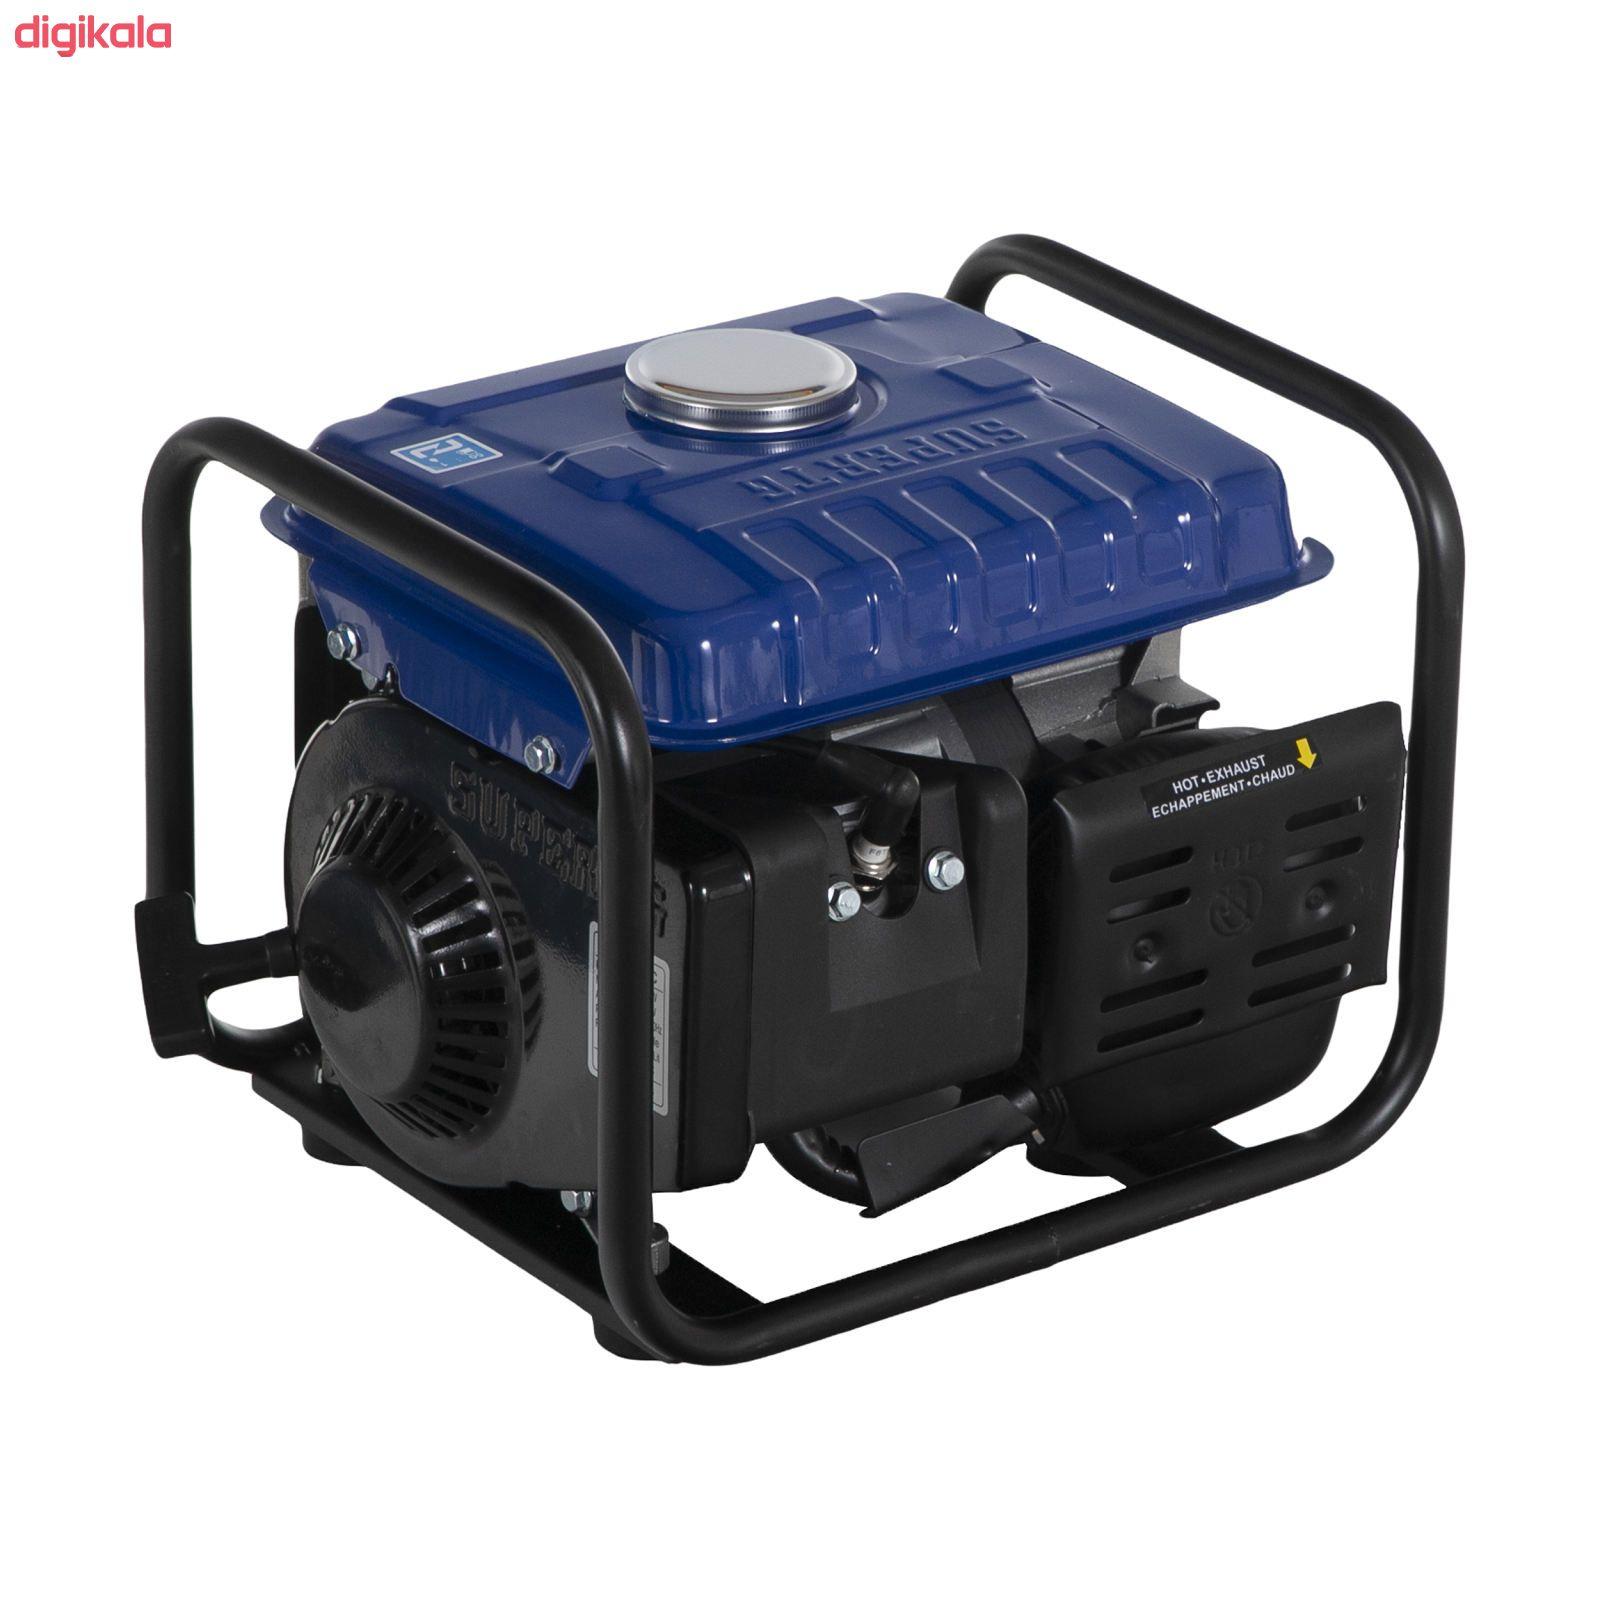 موتور برق بنزینی سوپر تی جی مدل TG2500DC کد 2 main 1 1